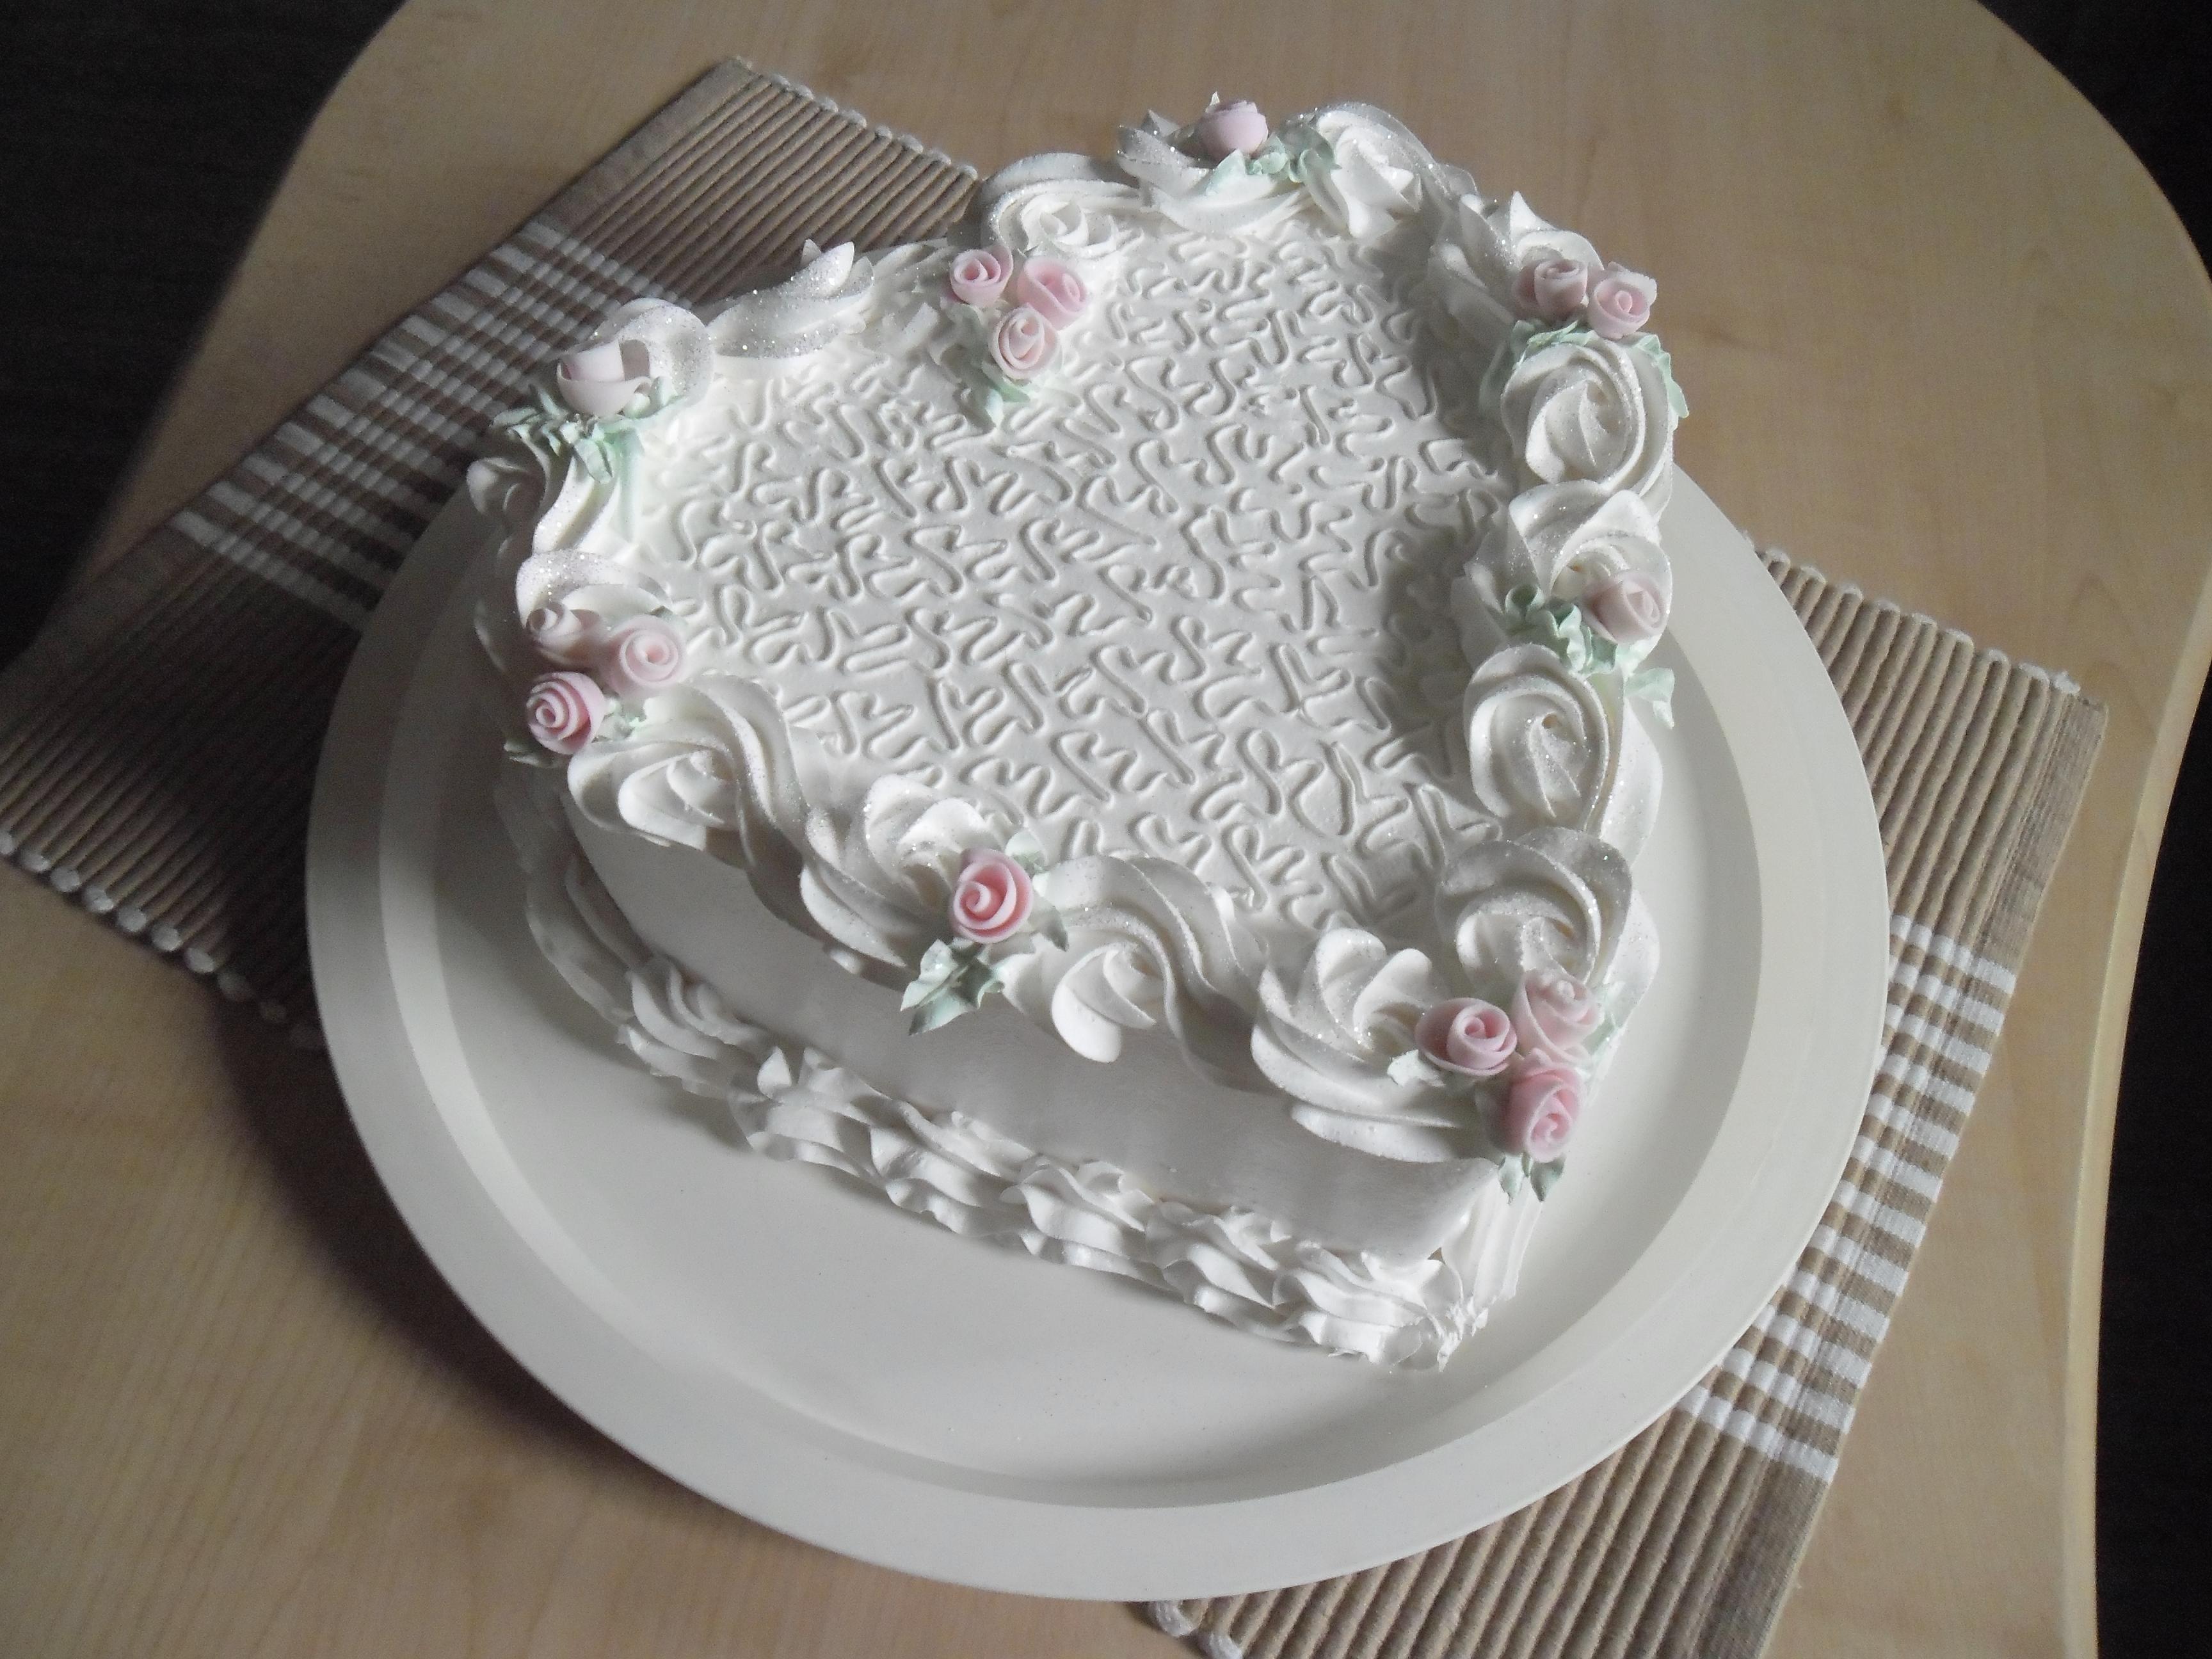 Mmjpg Cake Decorating Valentines Day Cakes Valentine Cake